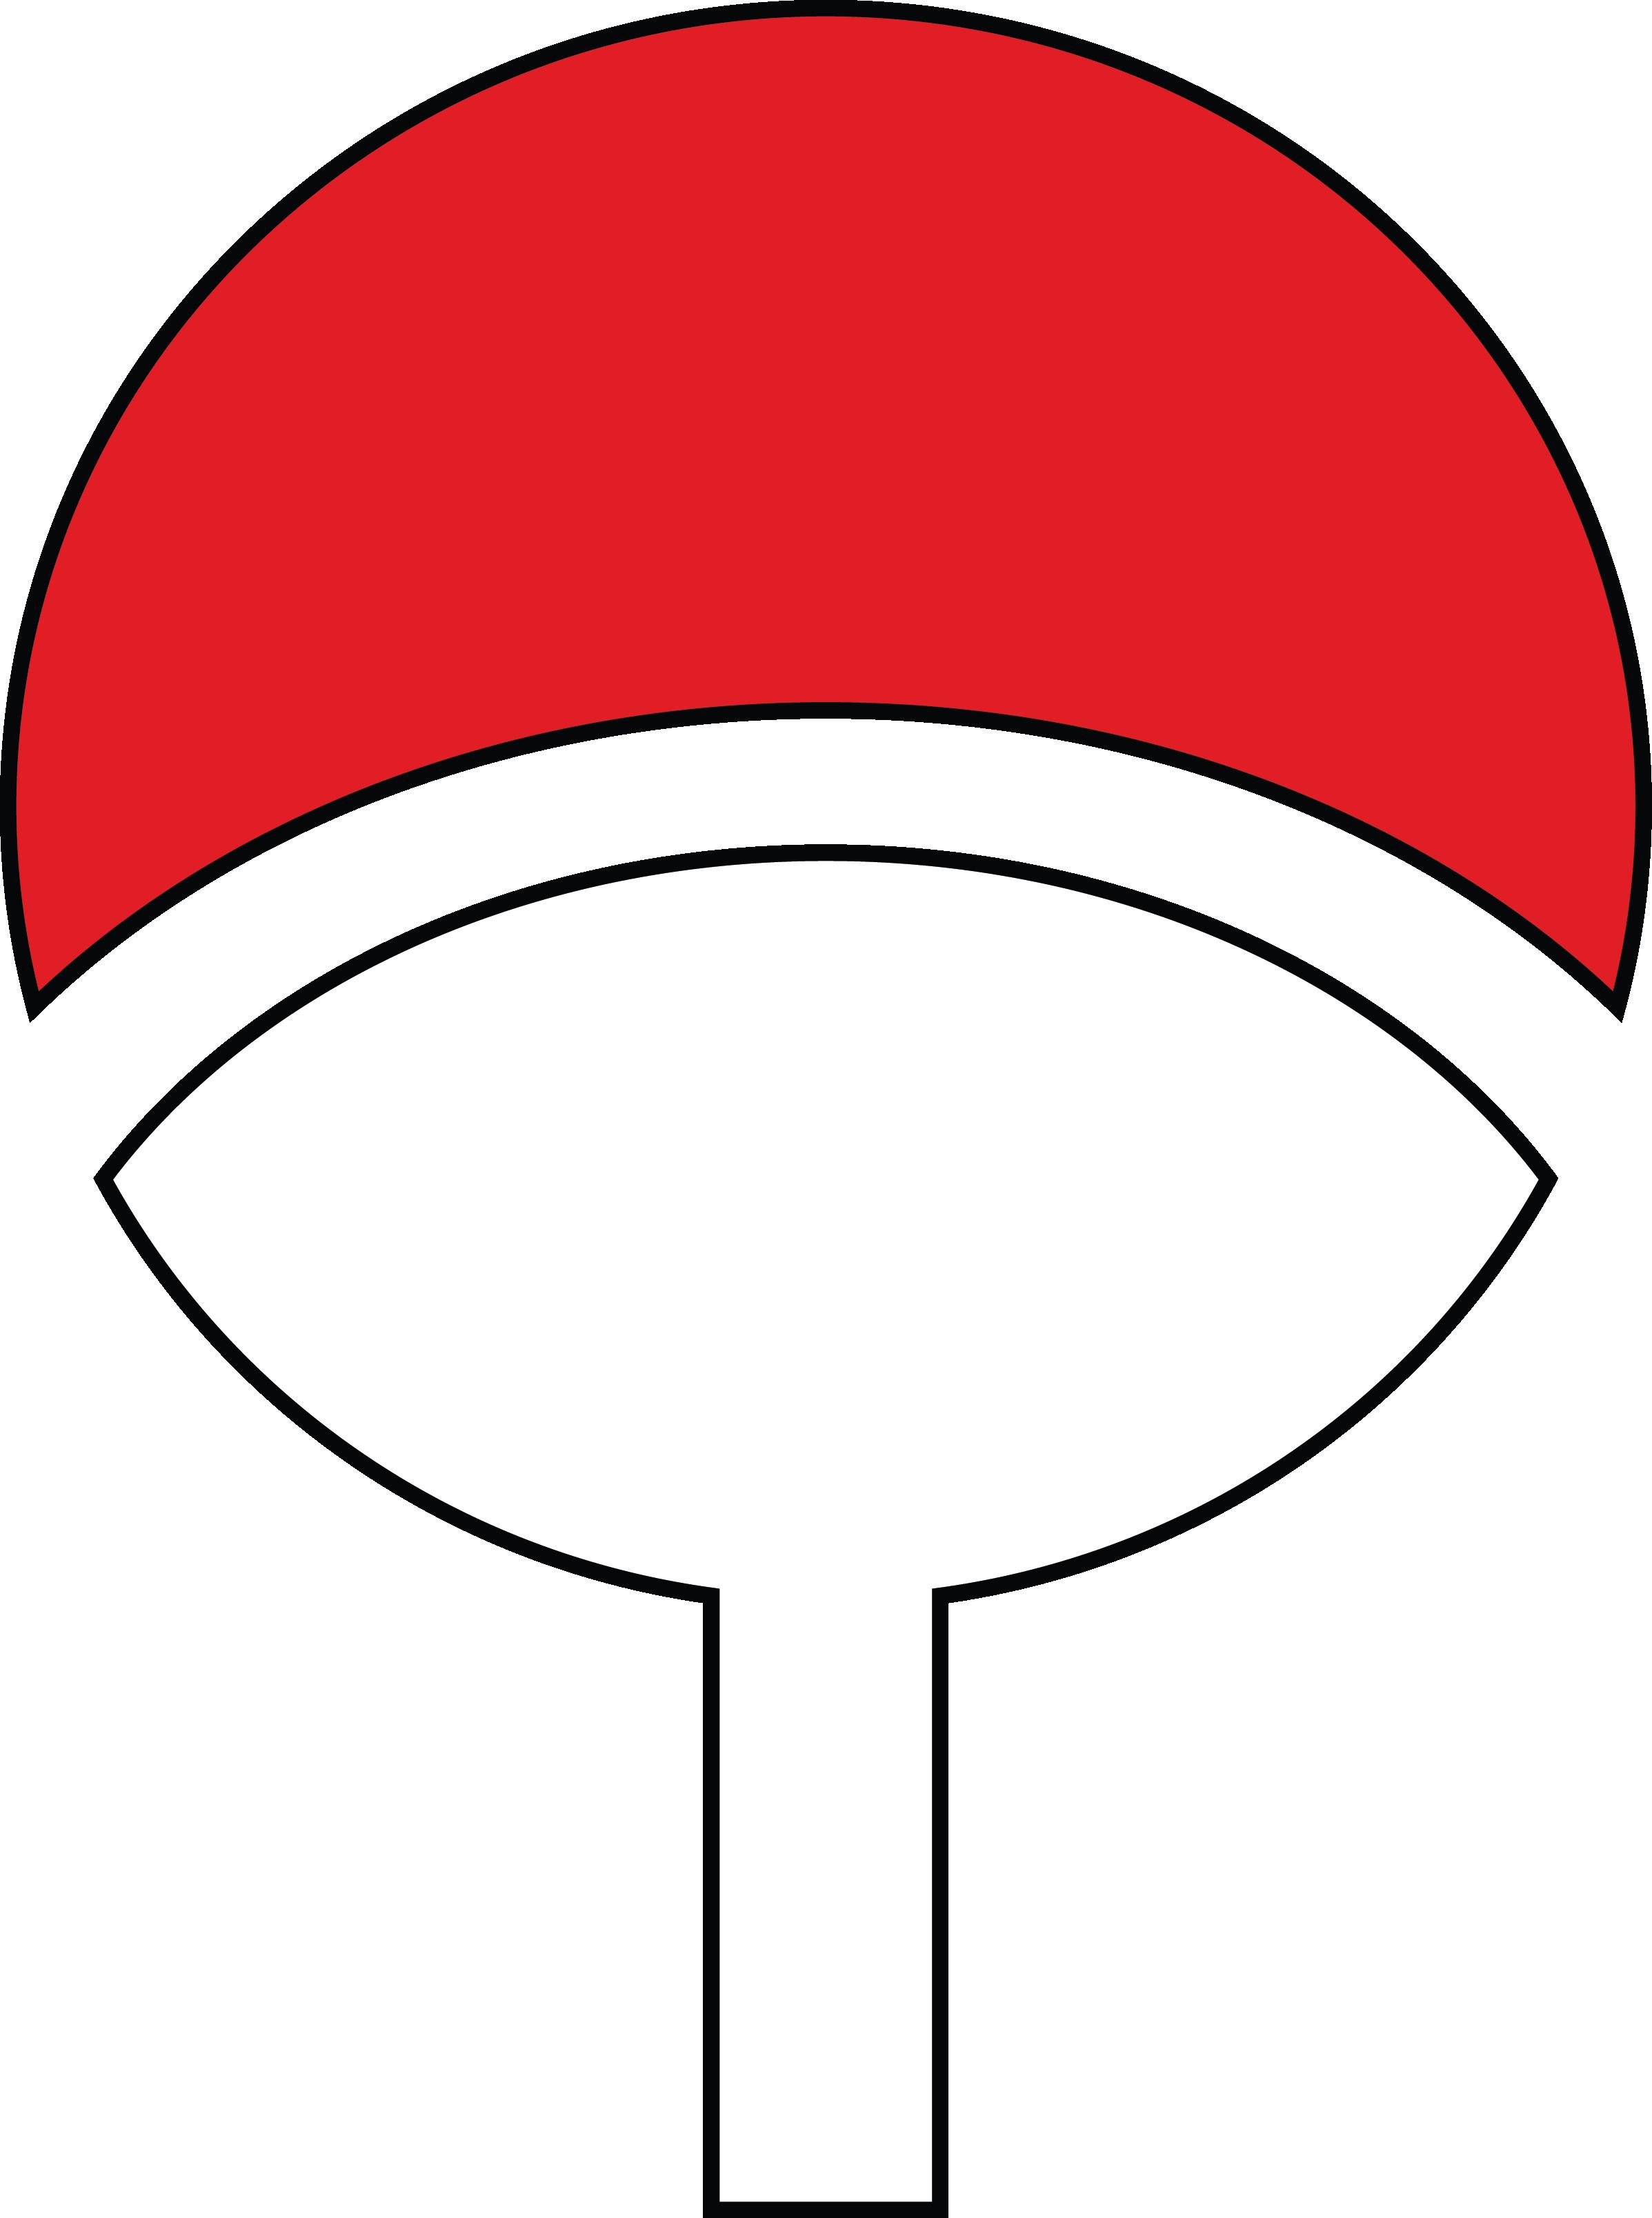 [Clã] Uchiha Uchiha_clan_symbol_by_elsid37-d4t4t8l